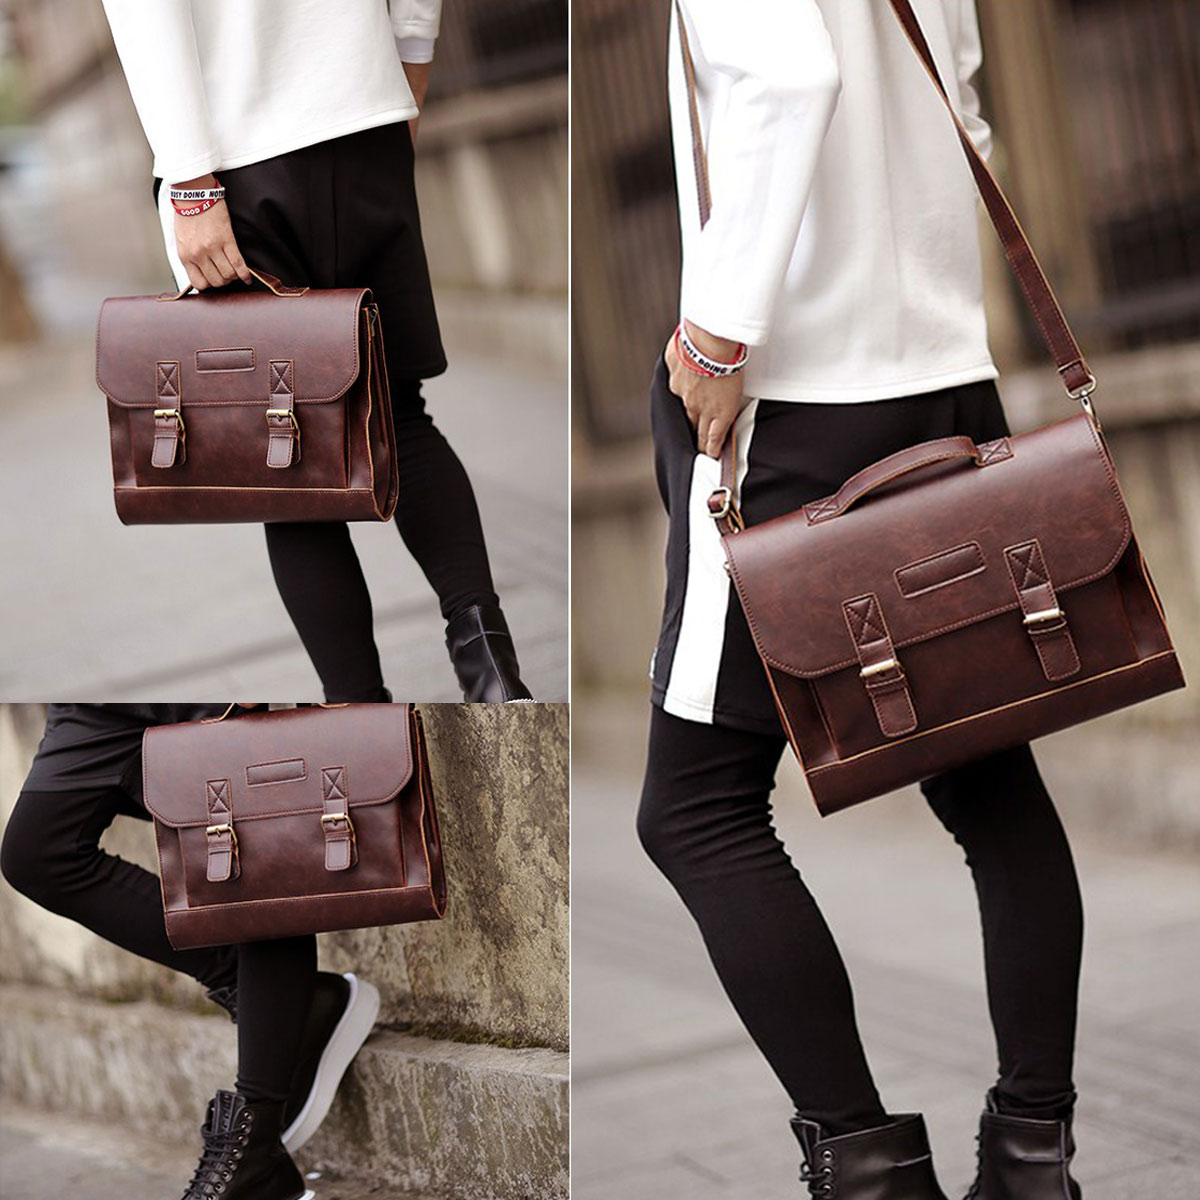 Details About Leather Briefcase Satchel 14 13 3 Laptop Bag Shoulder Messenger Men Women